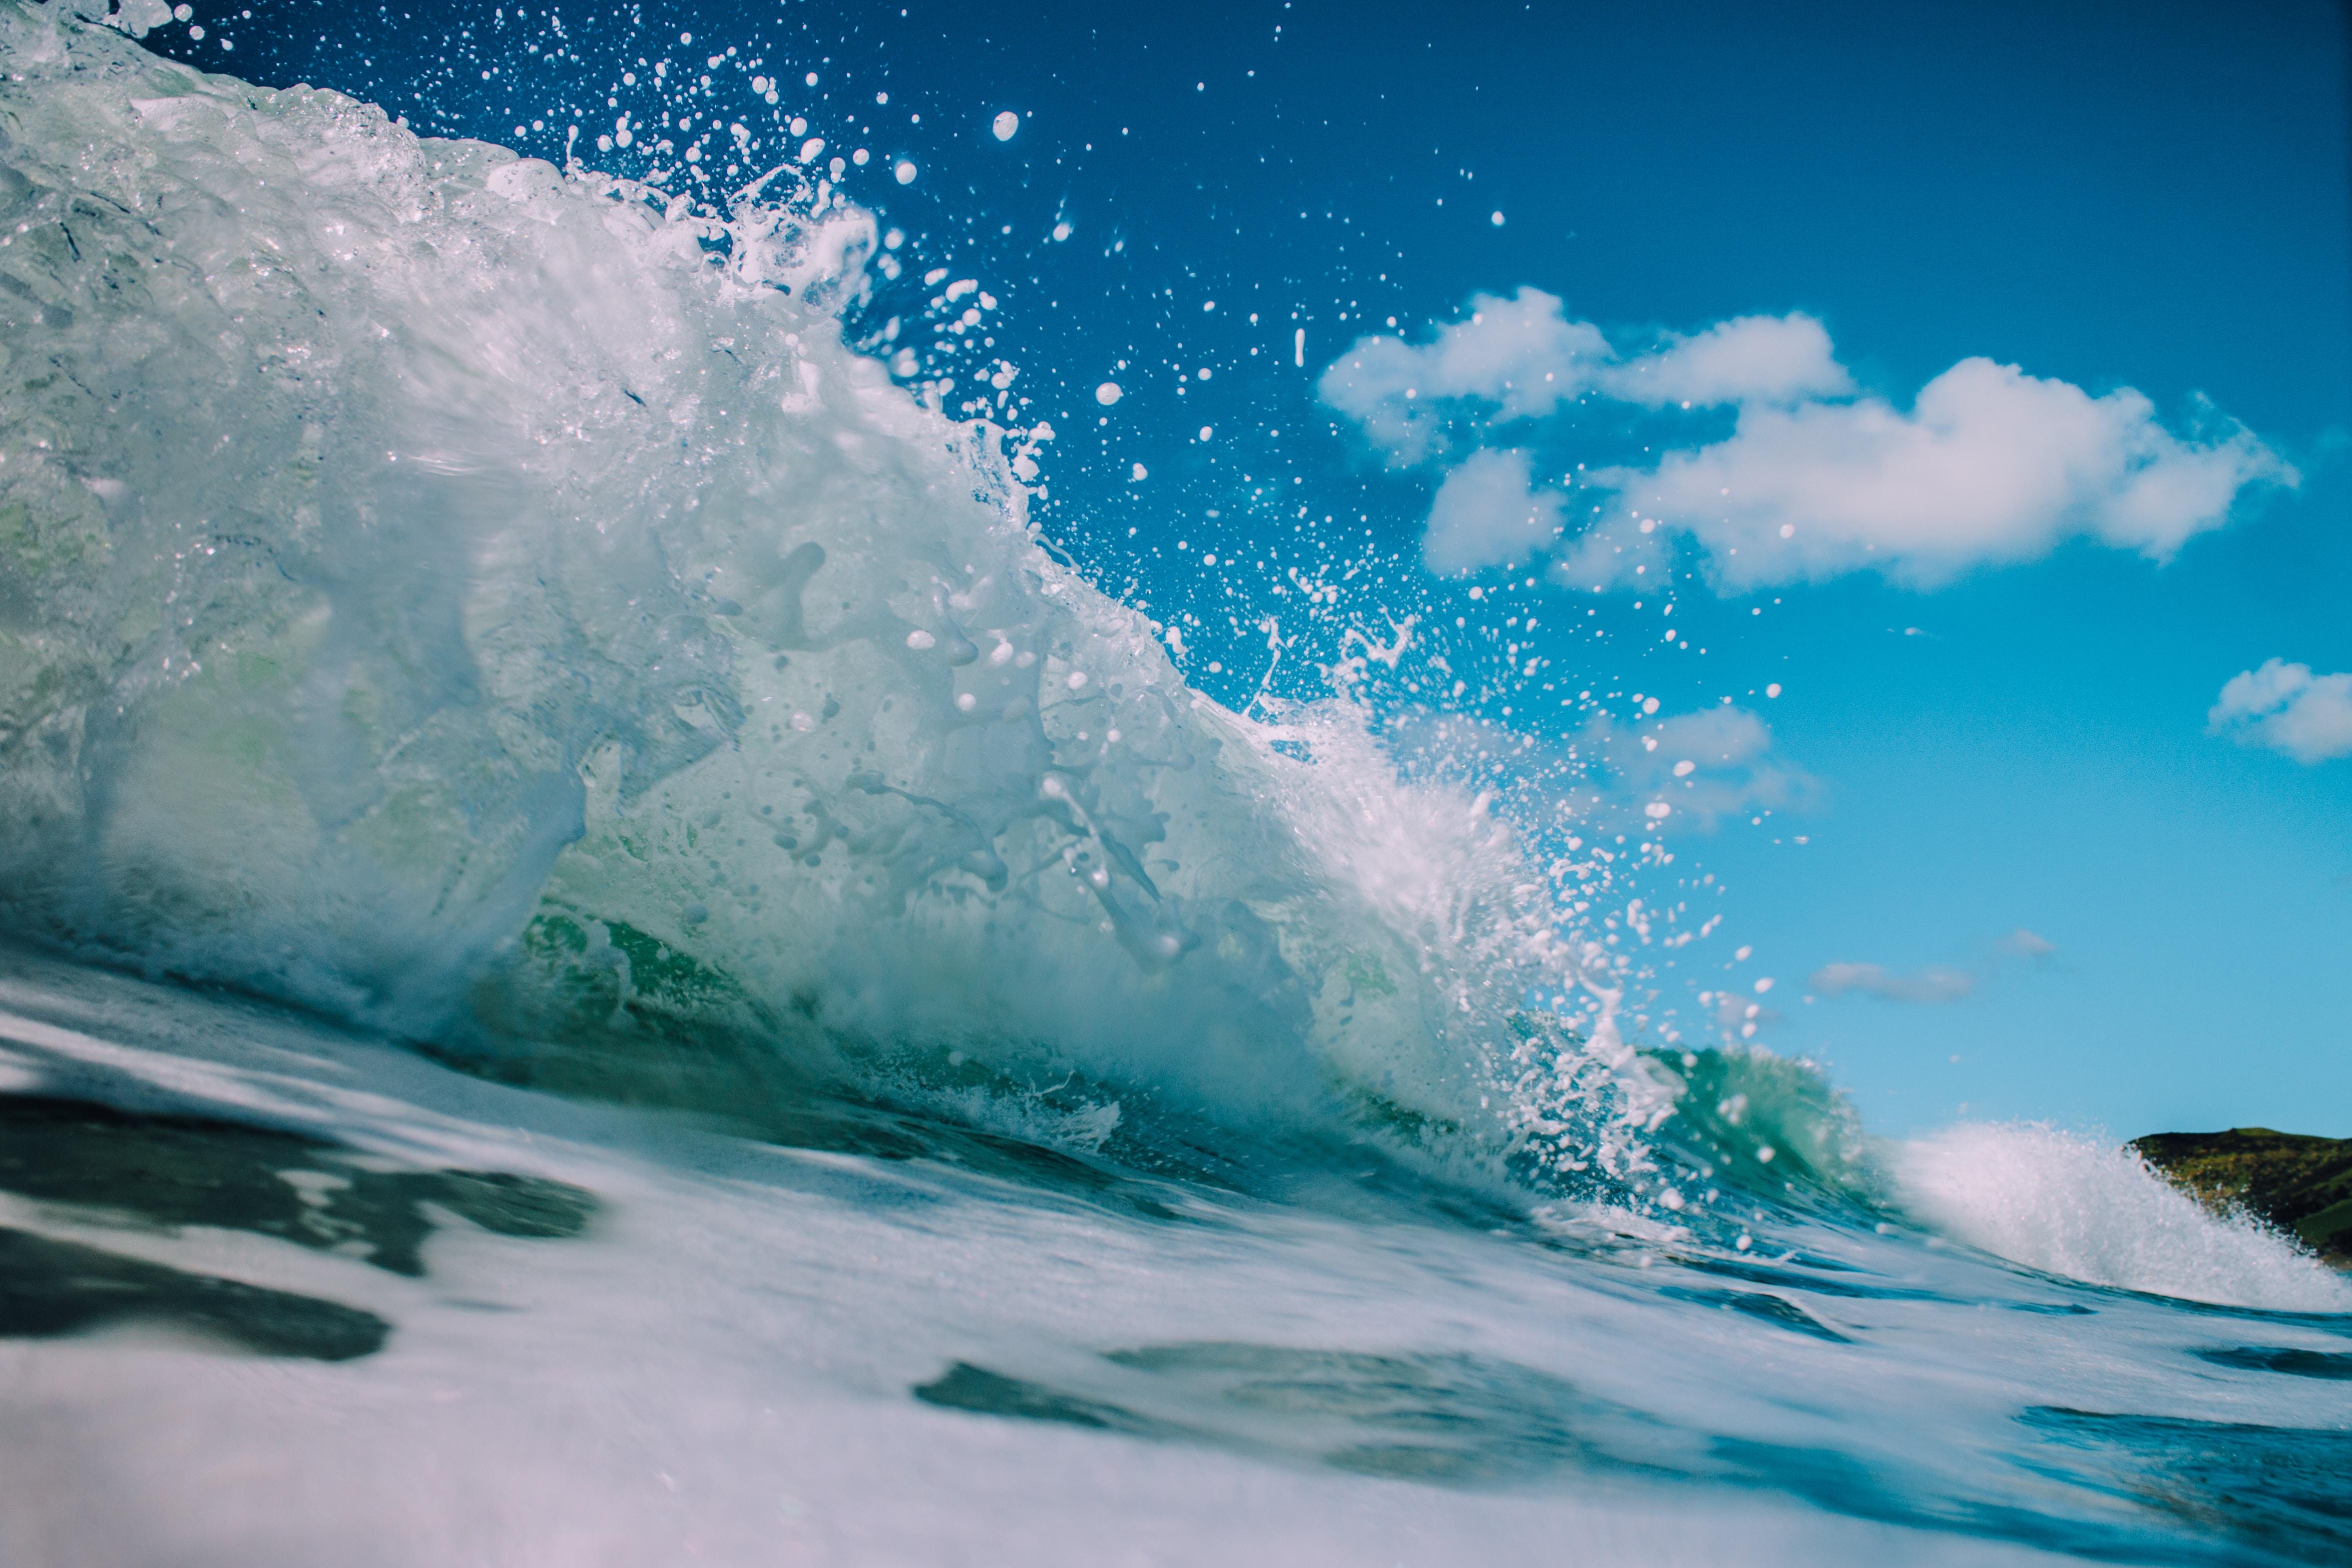 macro photography of splashing water waves